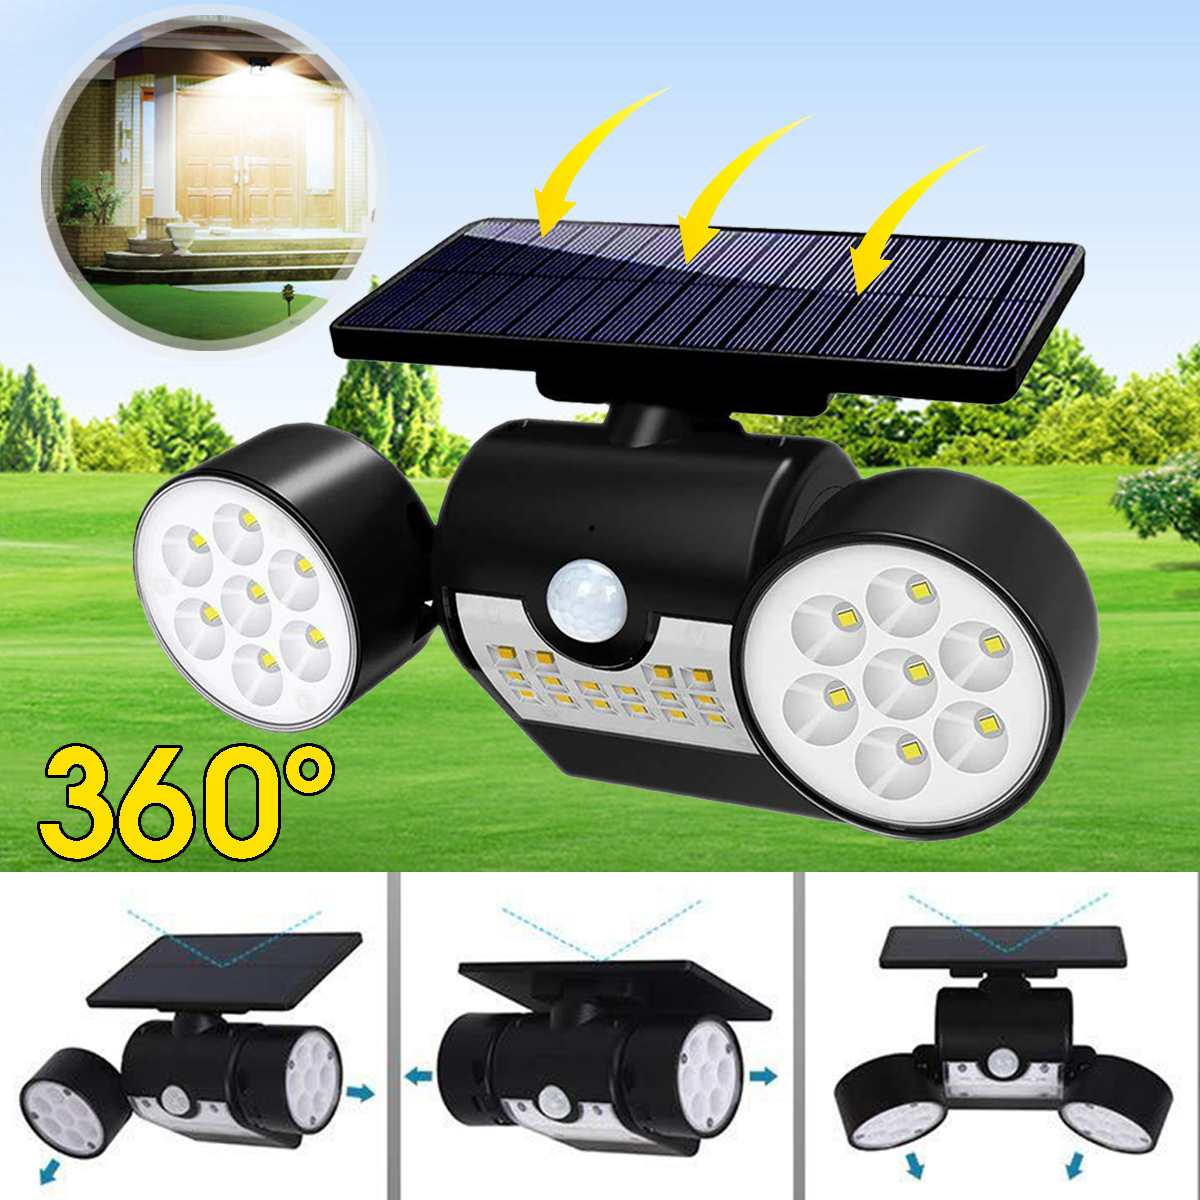 LED Solar Light Waterproof IP65 Dual Head Solar Lamp PIR Motion Sensor Light With Solar Panels Auto Turn On/Off Spotlight Home